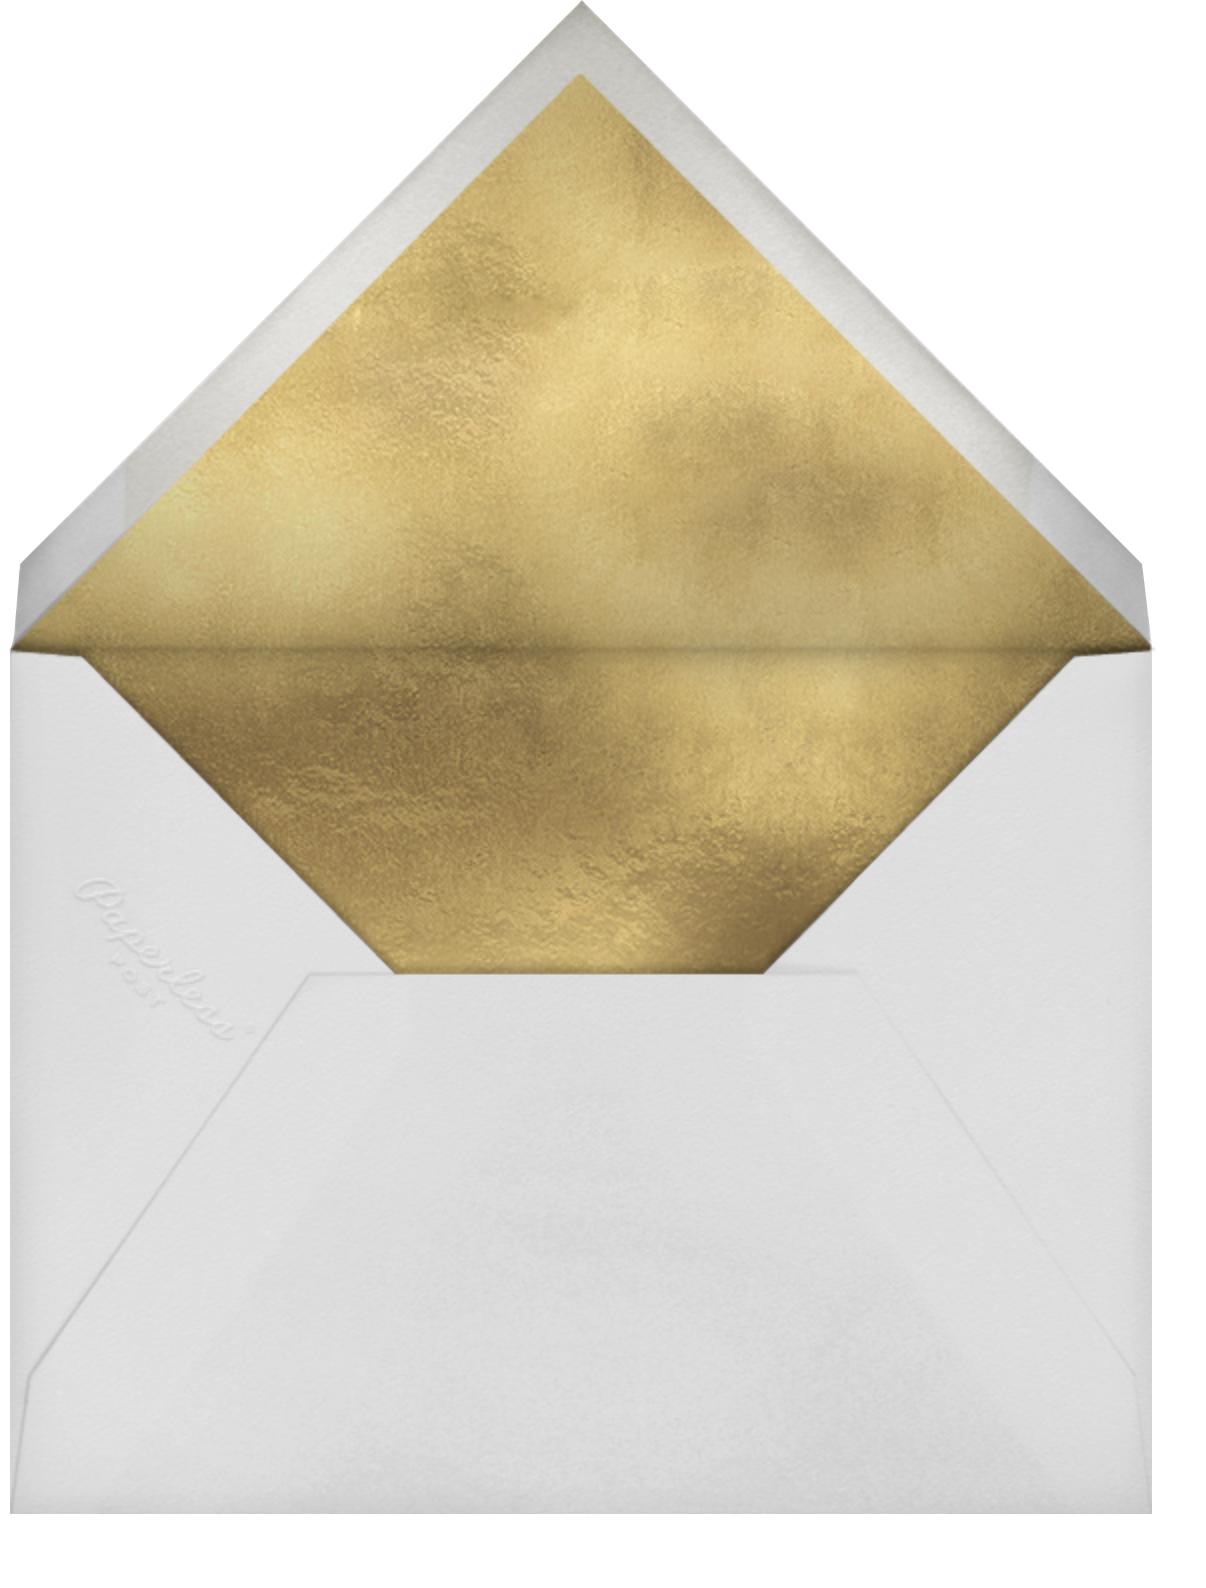 Better Daisies (Invitation) - Meringue - Mr. Boddington's Studio - All - envelope back